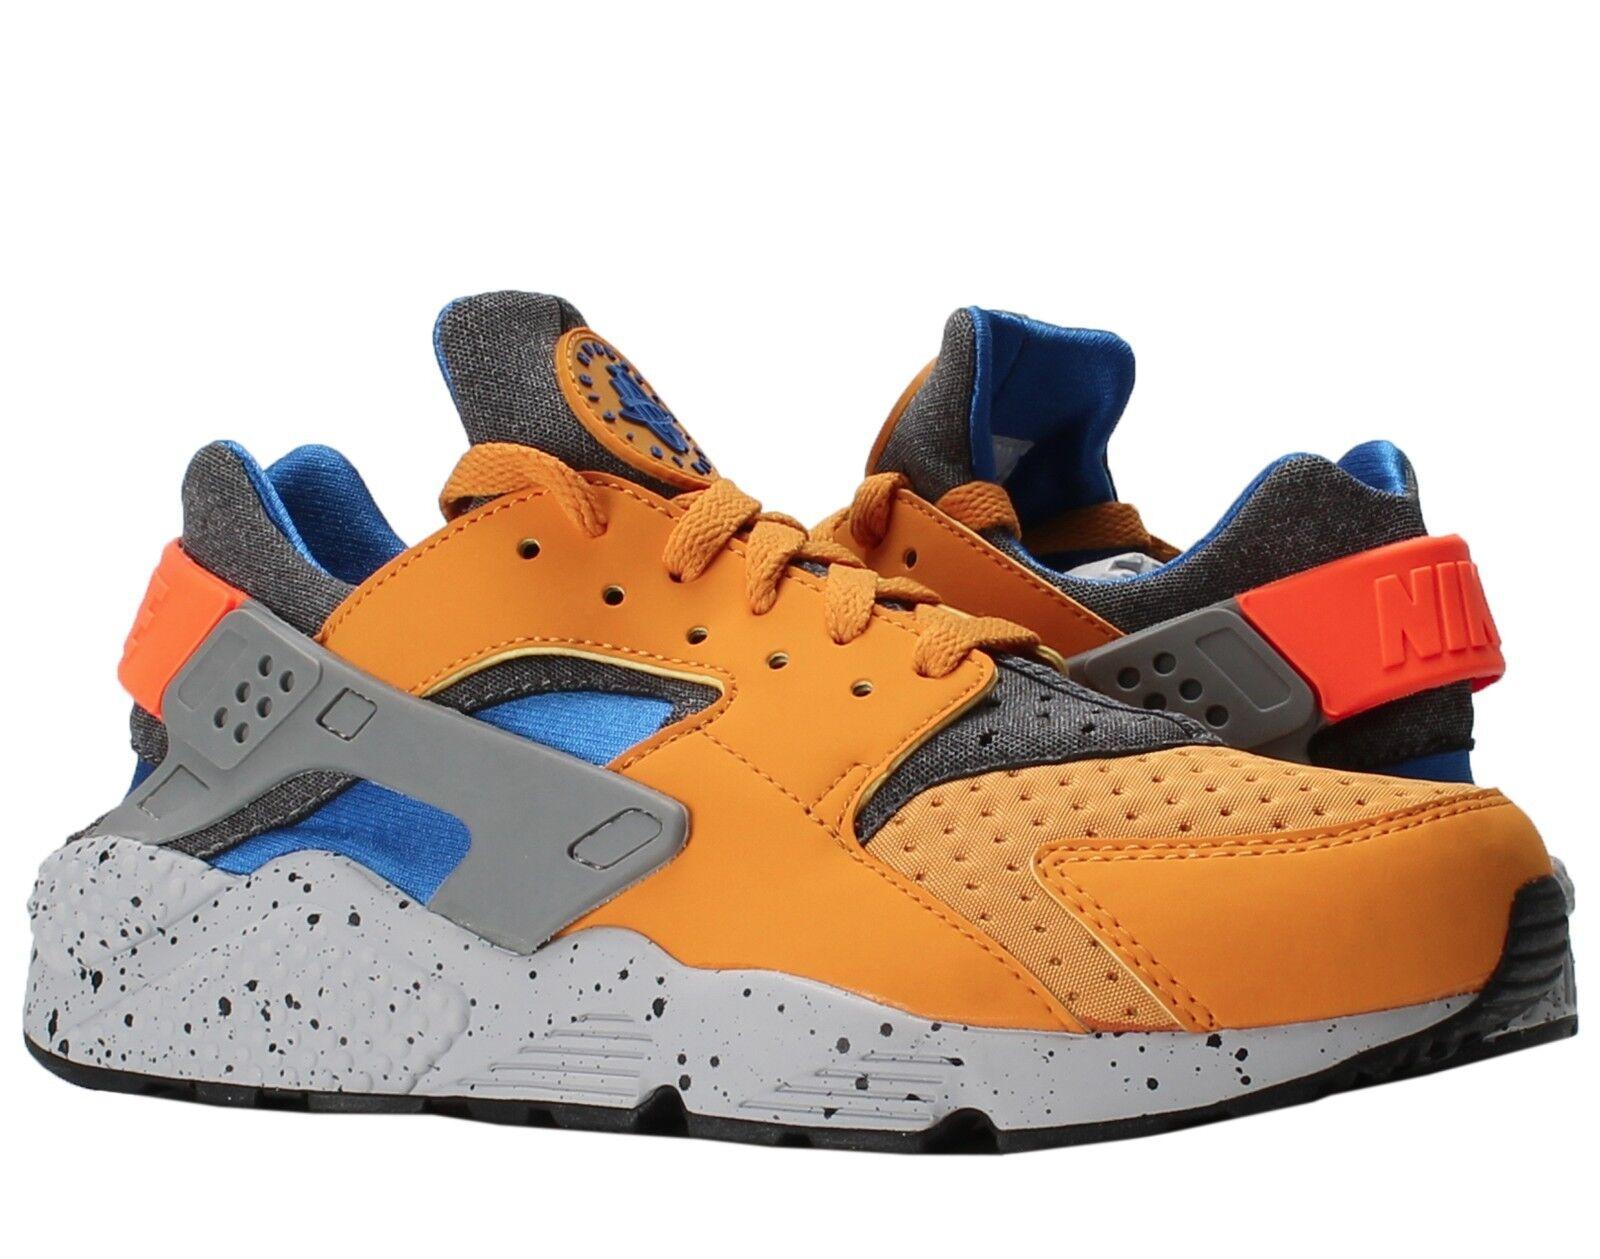 low cost c0913 6cbe7 70%OFF Nike Air Huarache Run SE Gold Leaf Hyper Cobalt Men s Running Shoes